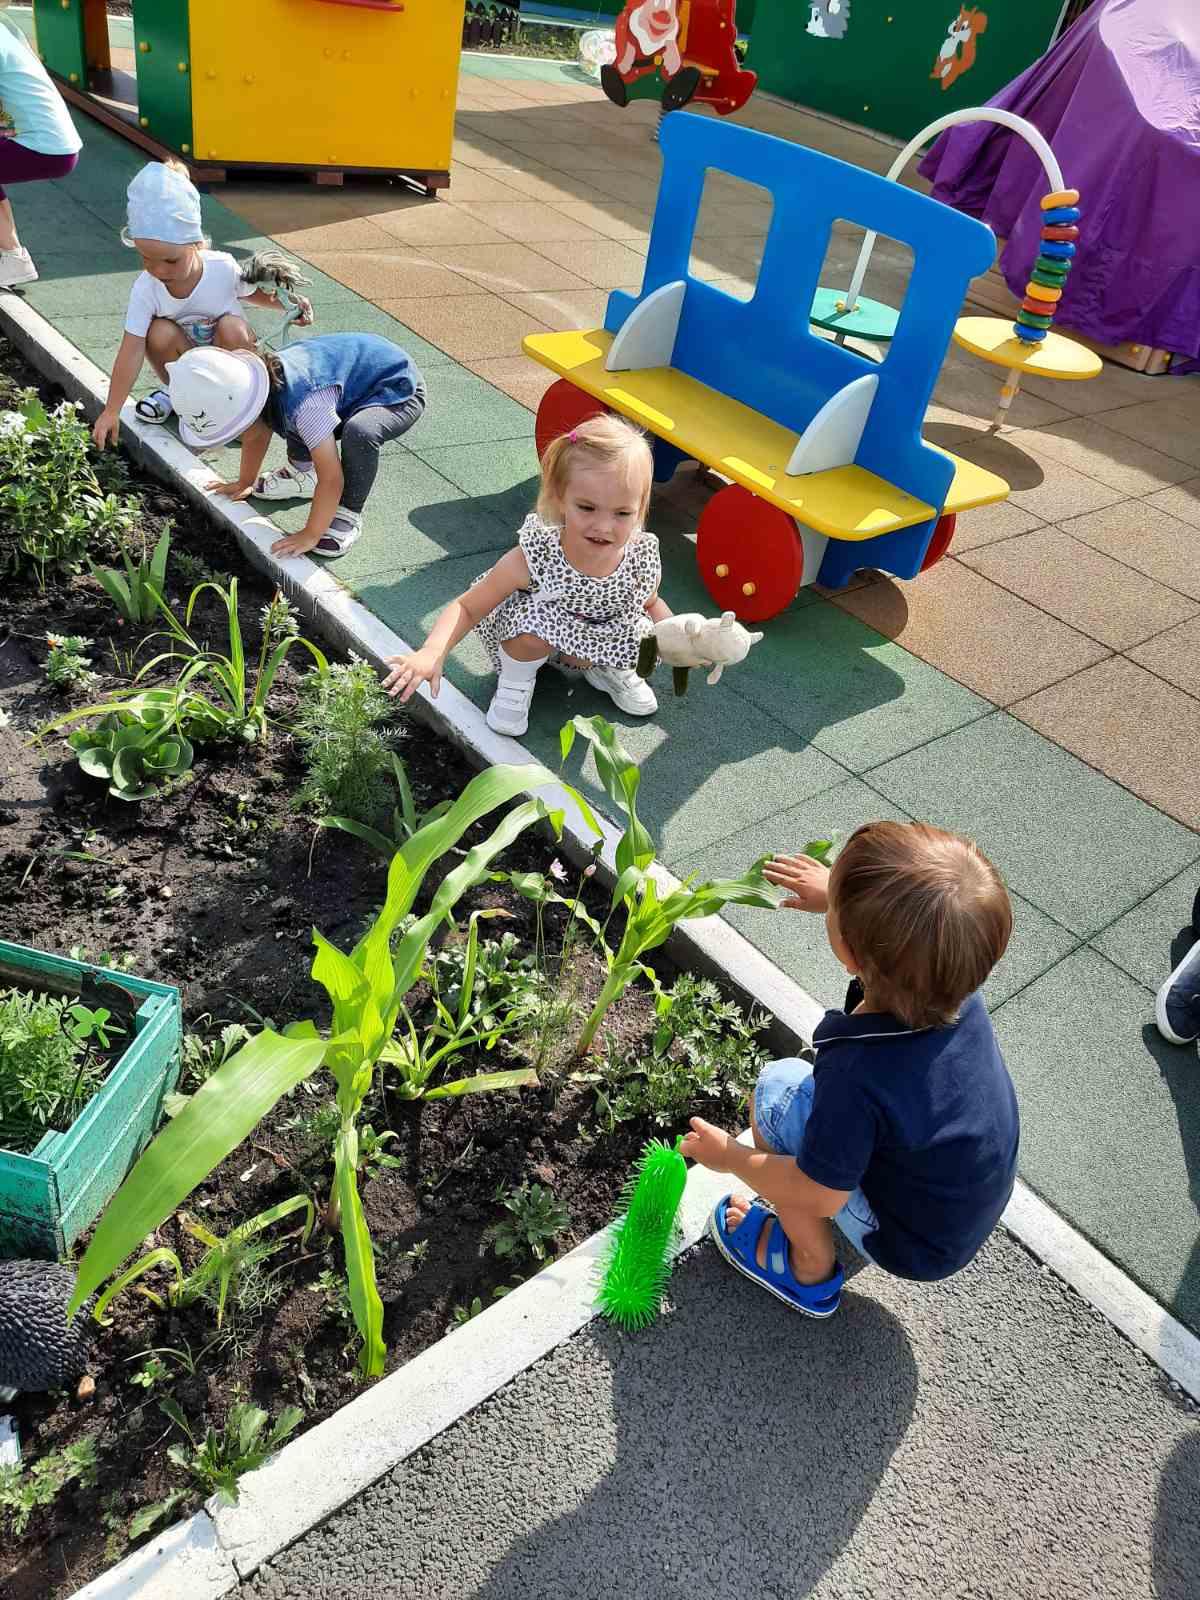 картинка посадили огород посмотрите что растет